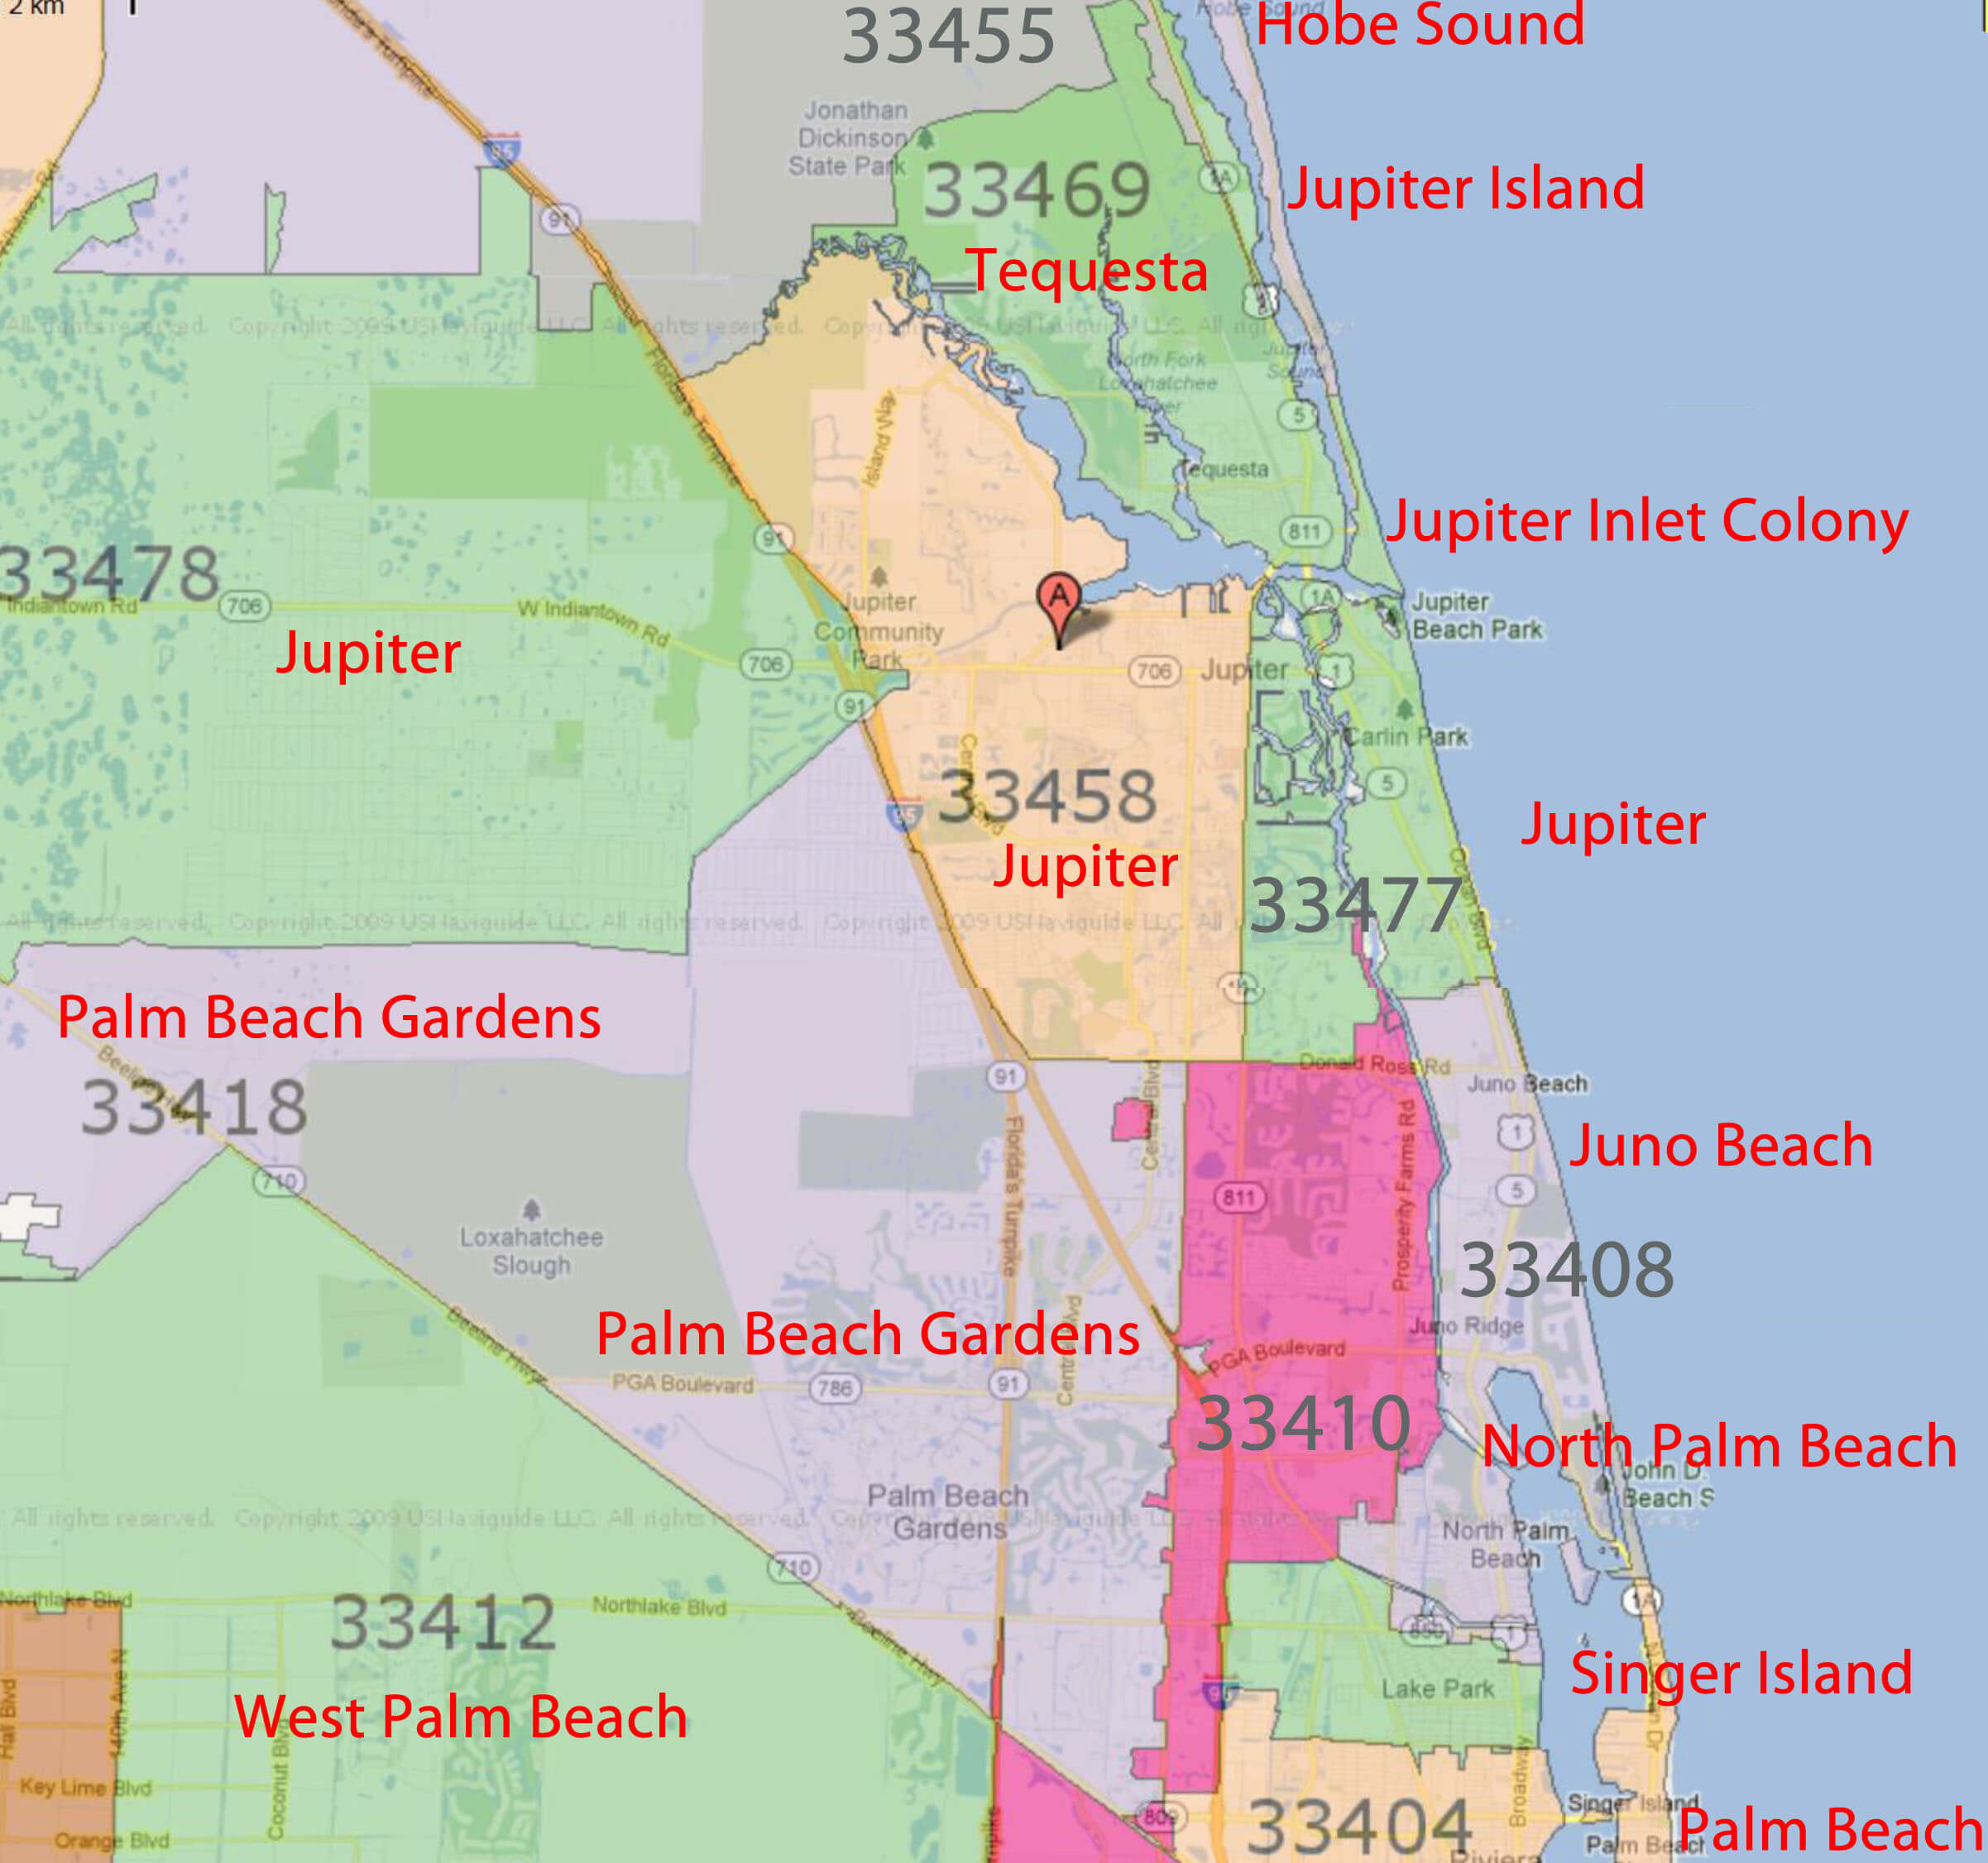 Palm Beach Gardens, Jupiter Florida Real Estatezip Code - Zip Code Map Of Palm Beach County Florida